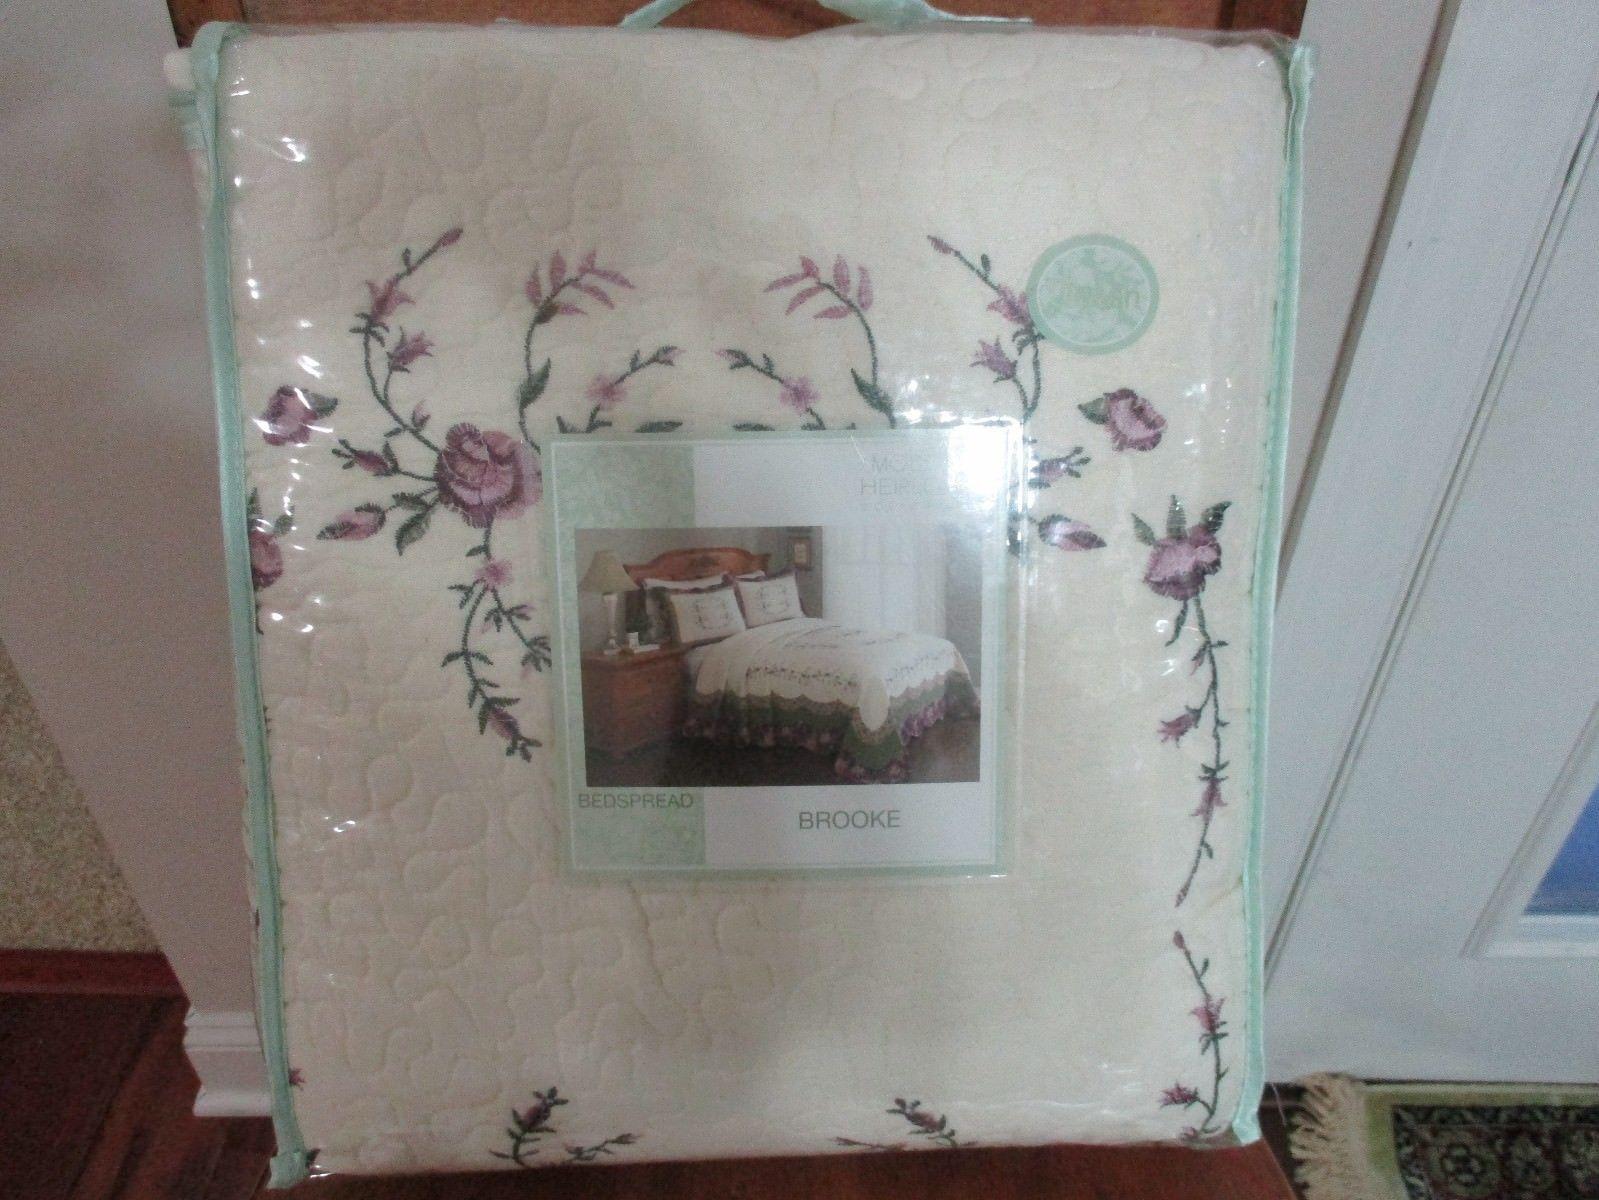 BNIP Modern Heirloom Collection Brooke Cotton Filled Bedspread OR Shams, Pick - $108.90 - $113.85